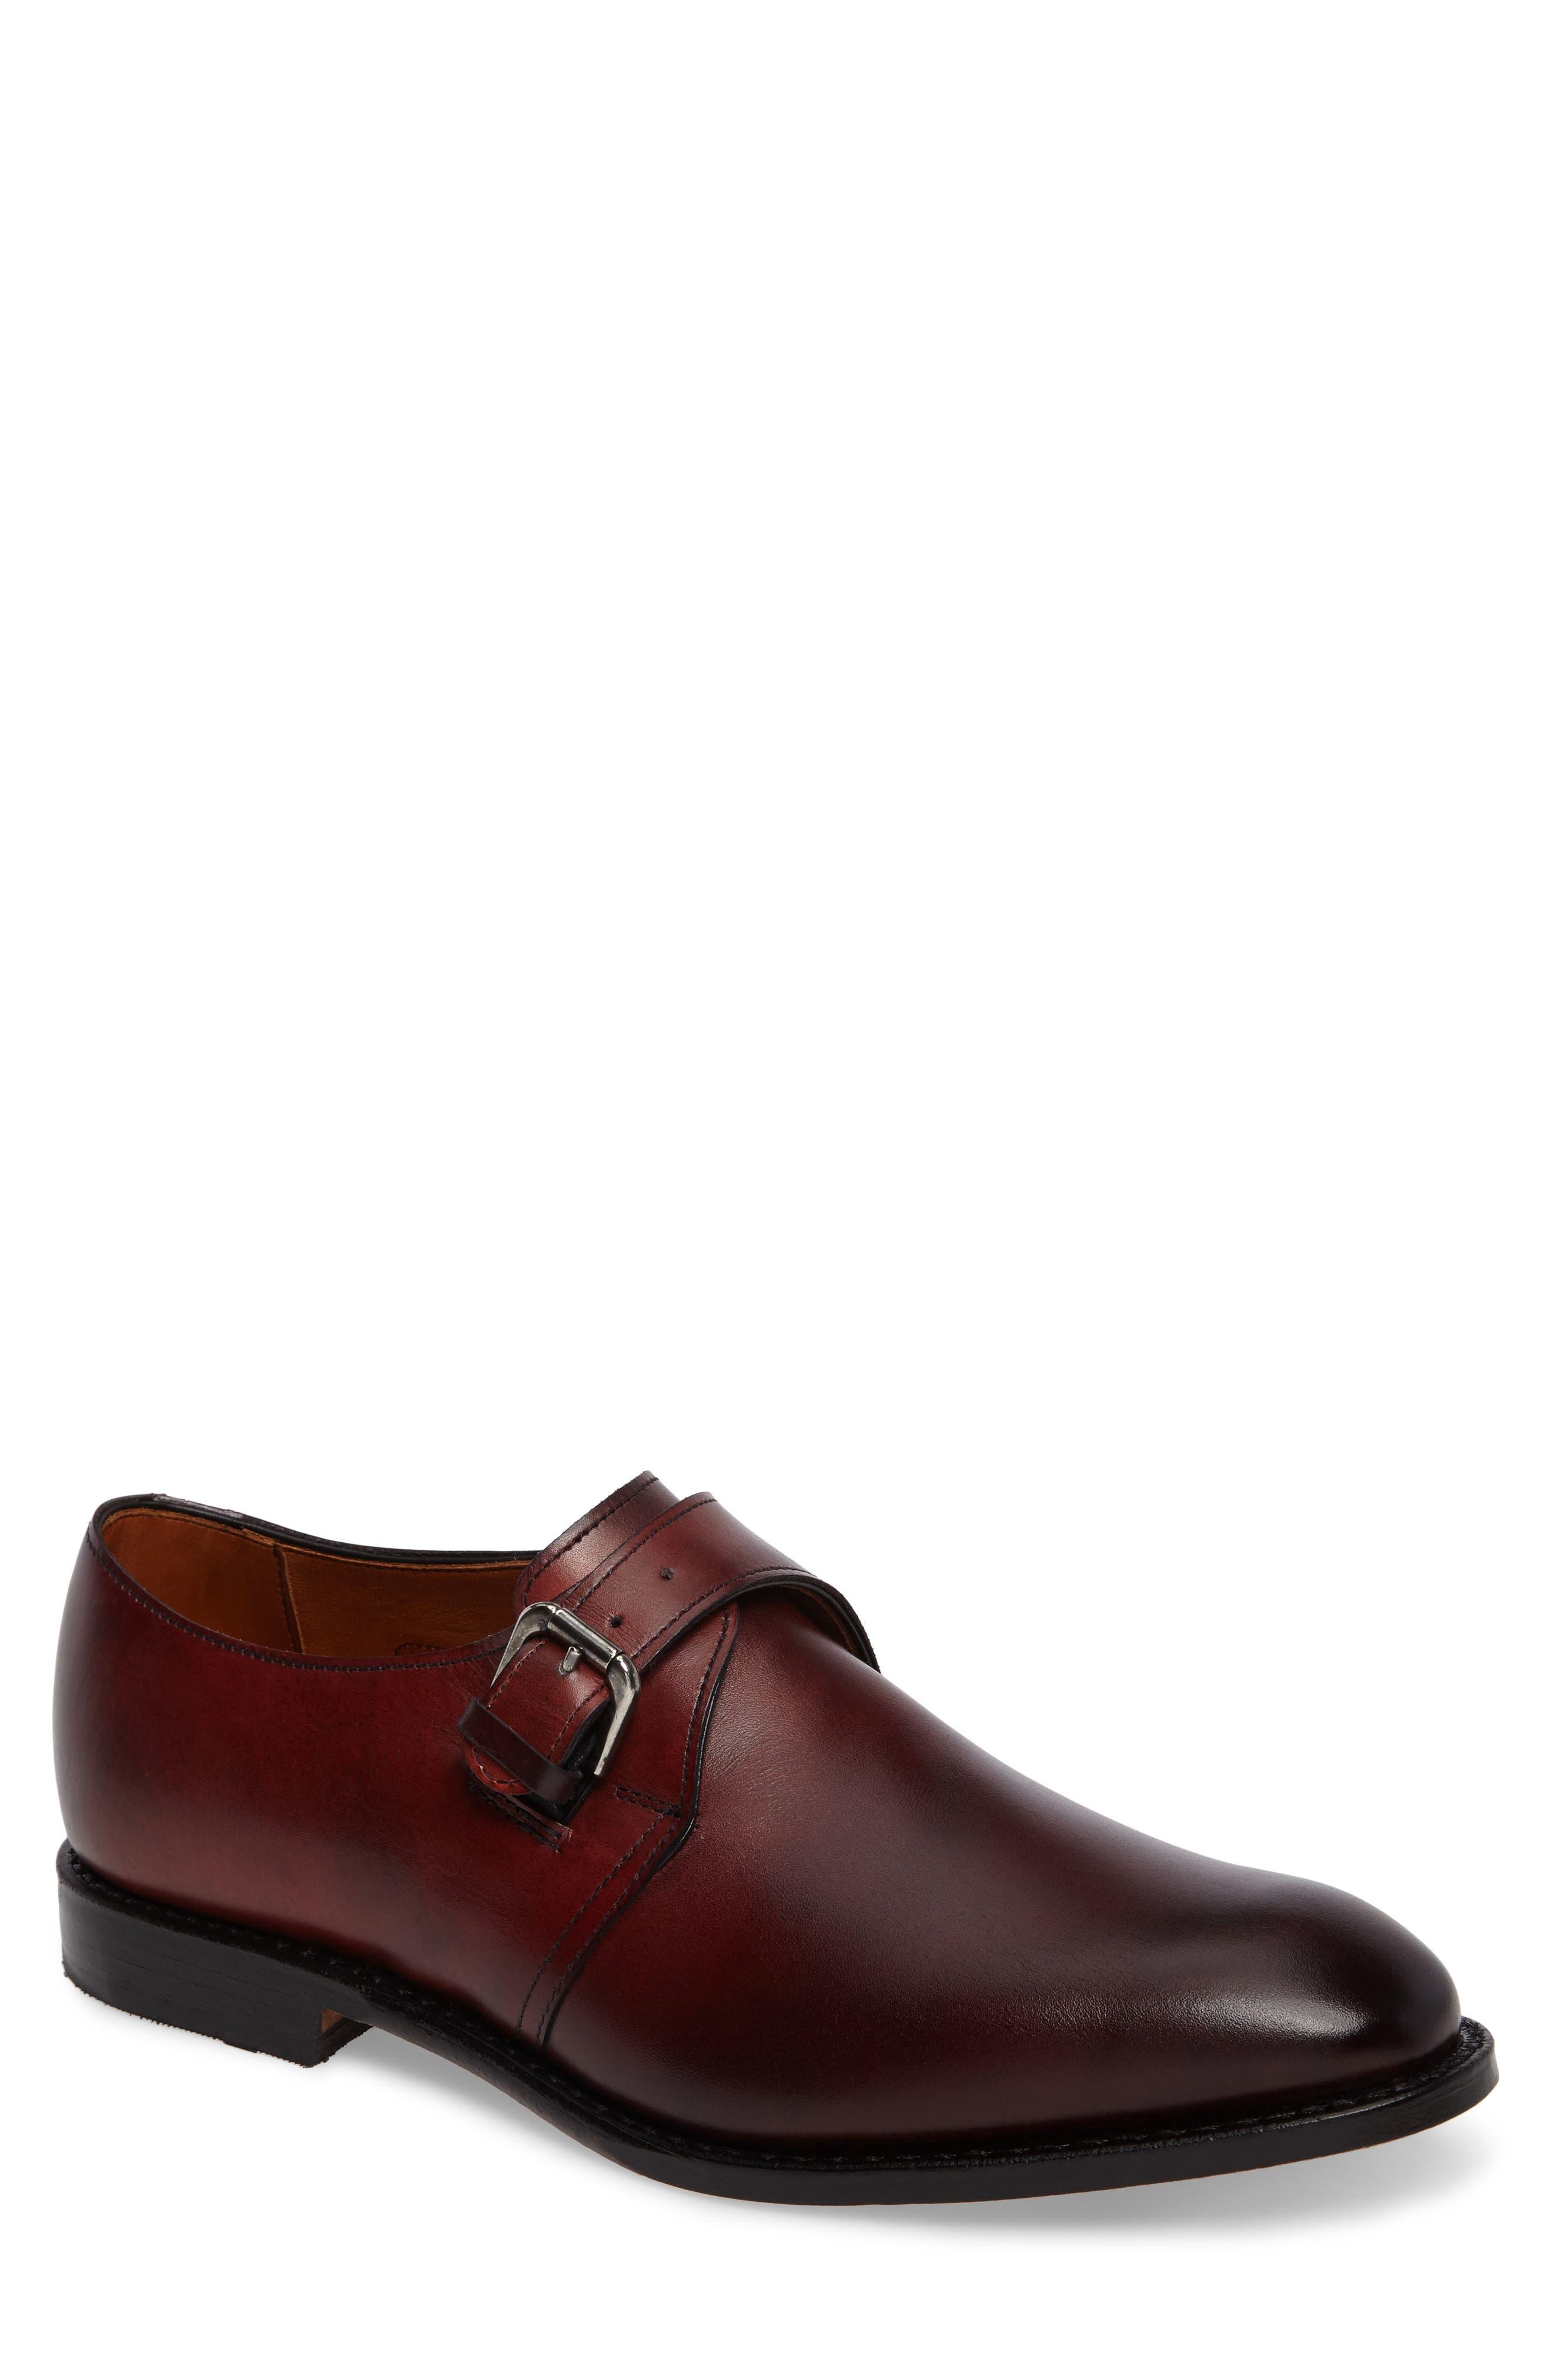 Warwick Monk Strap Shoe,                             Main thumbnail 1, color,                             Oxblood Leather